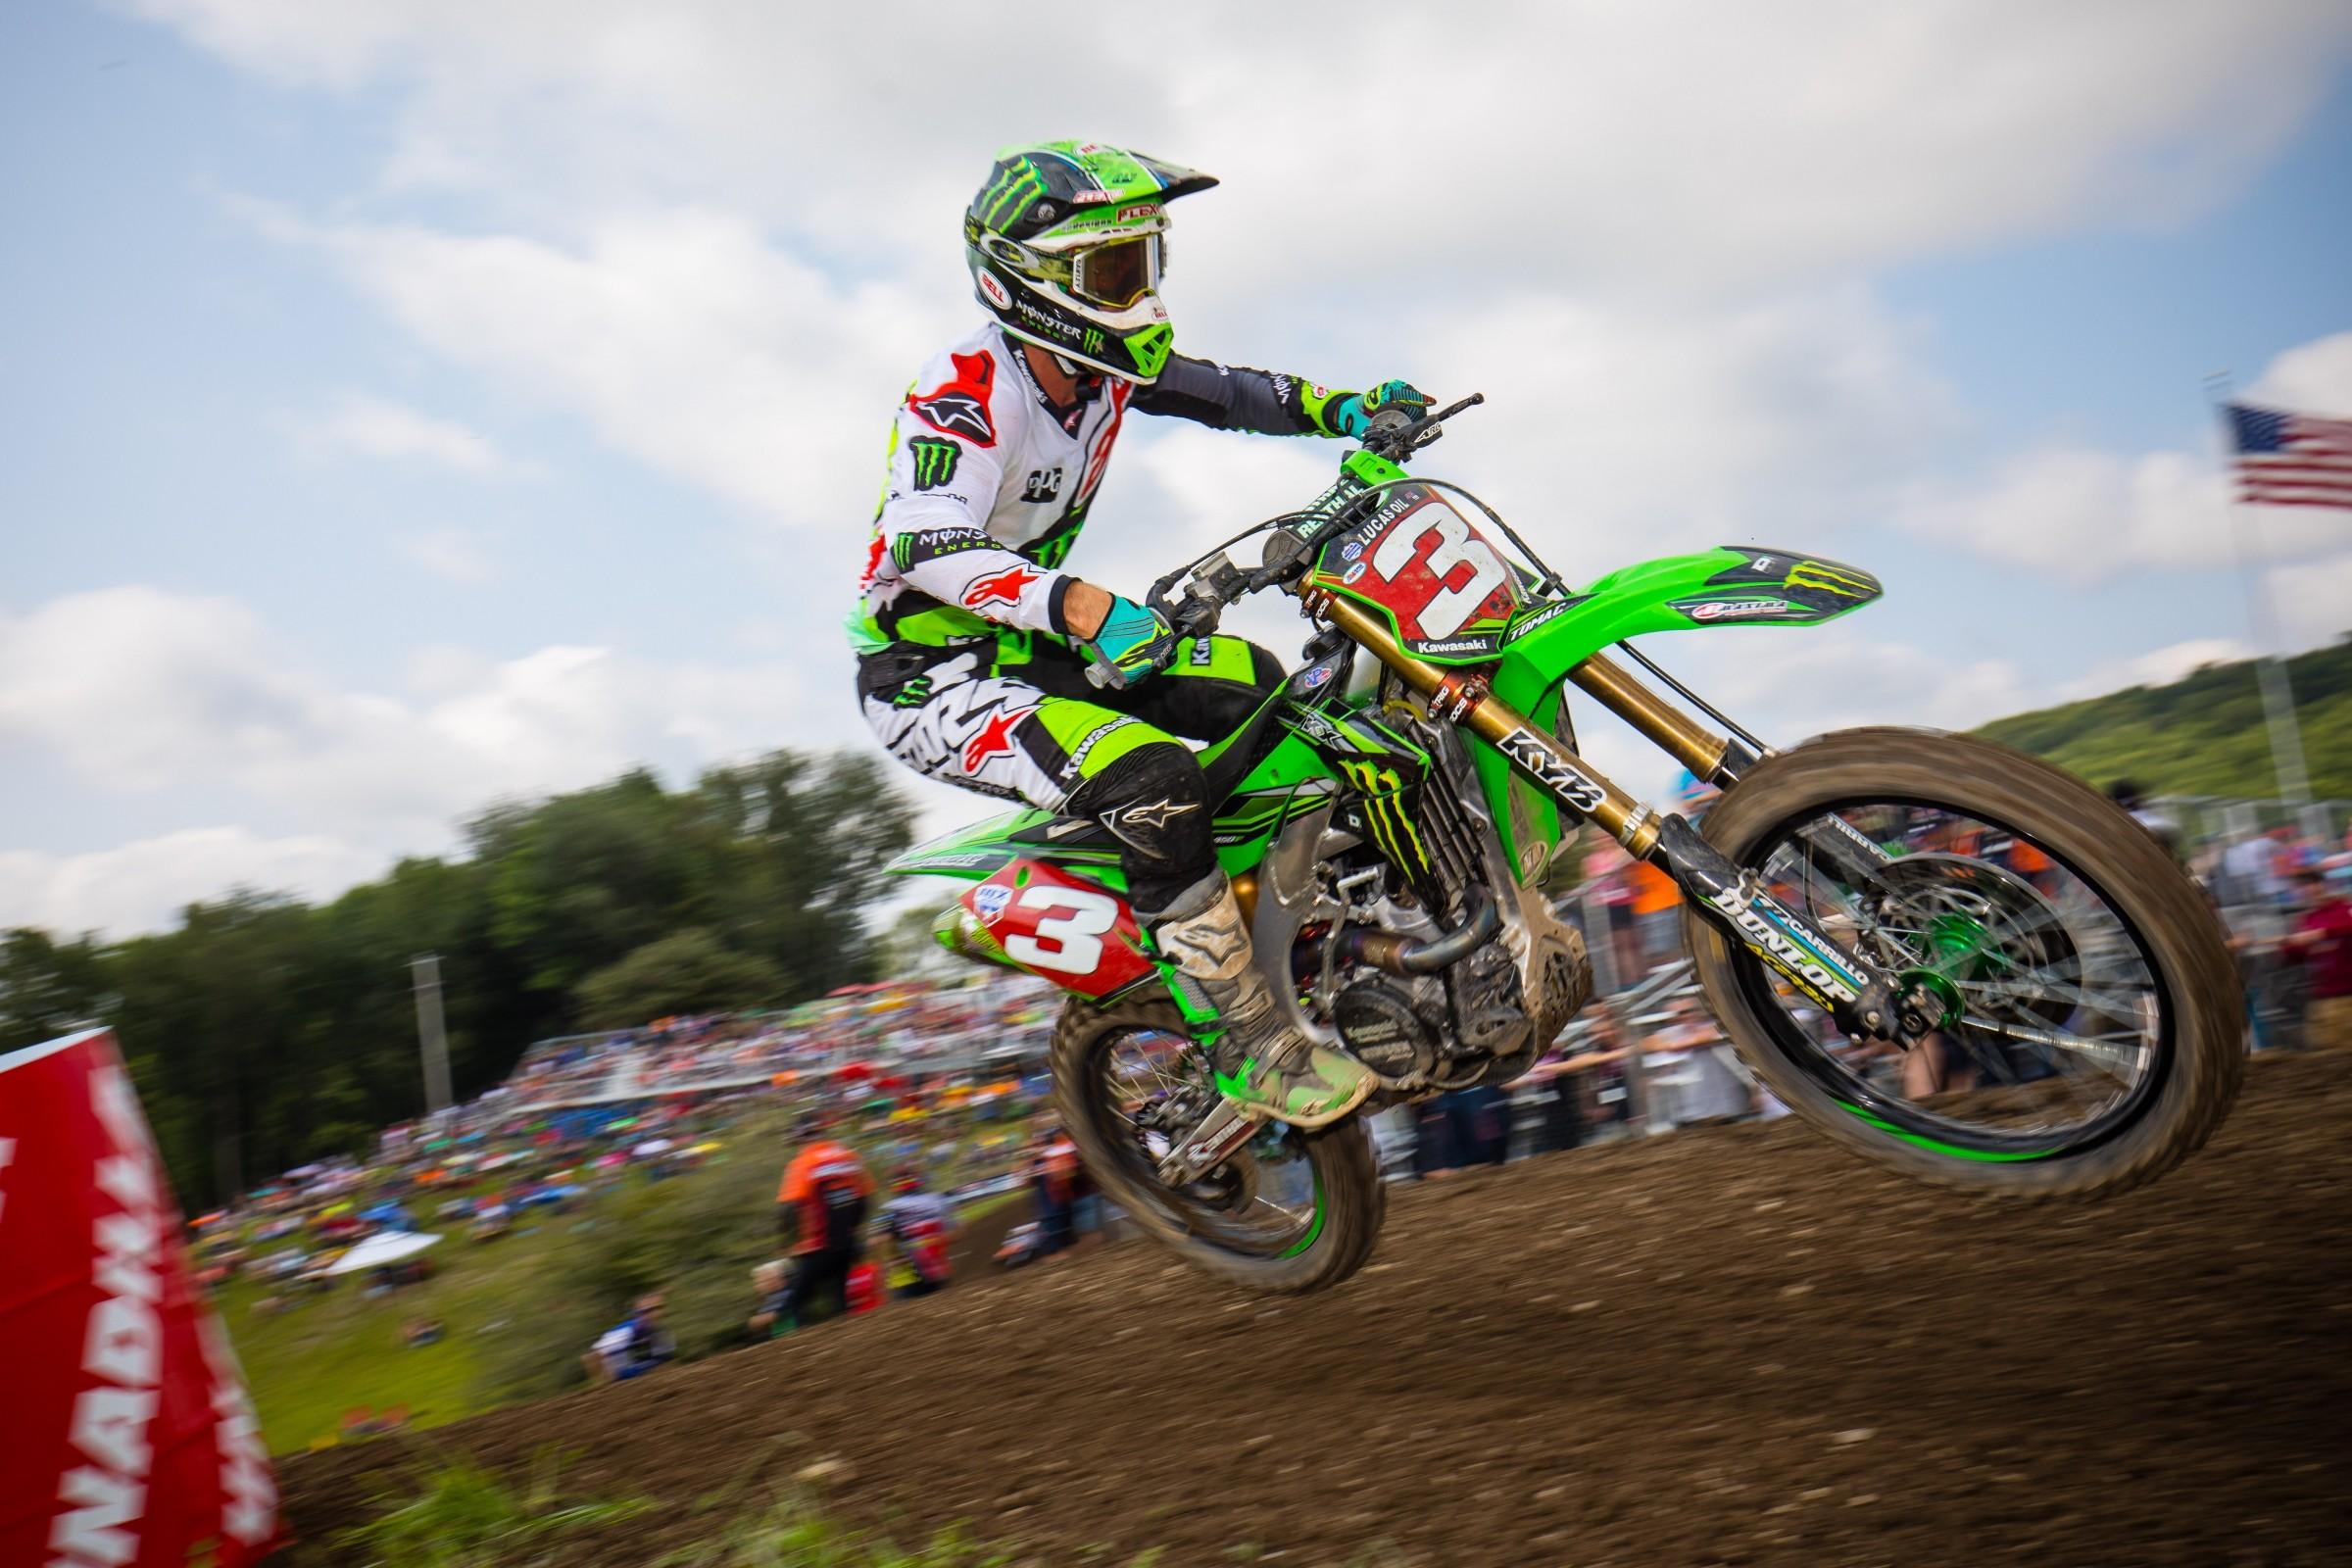 Tomac Talks Pro Motocross and MXoN - Motocross - Racer X Online